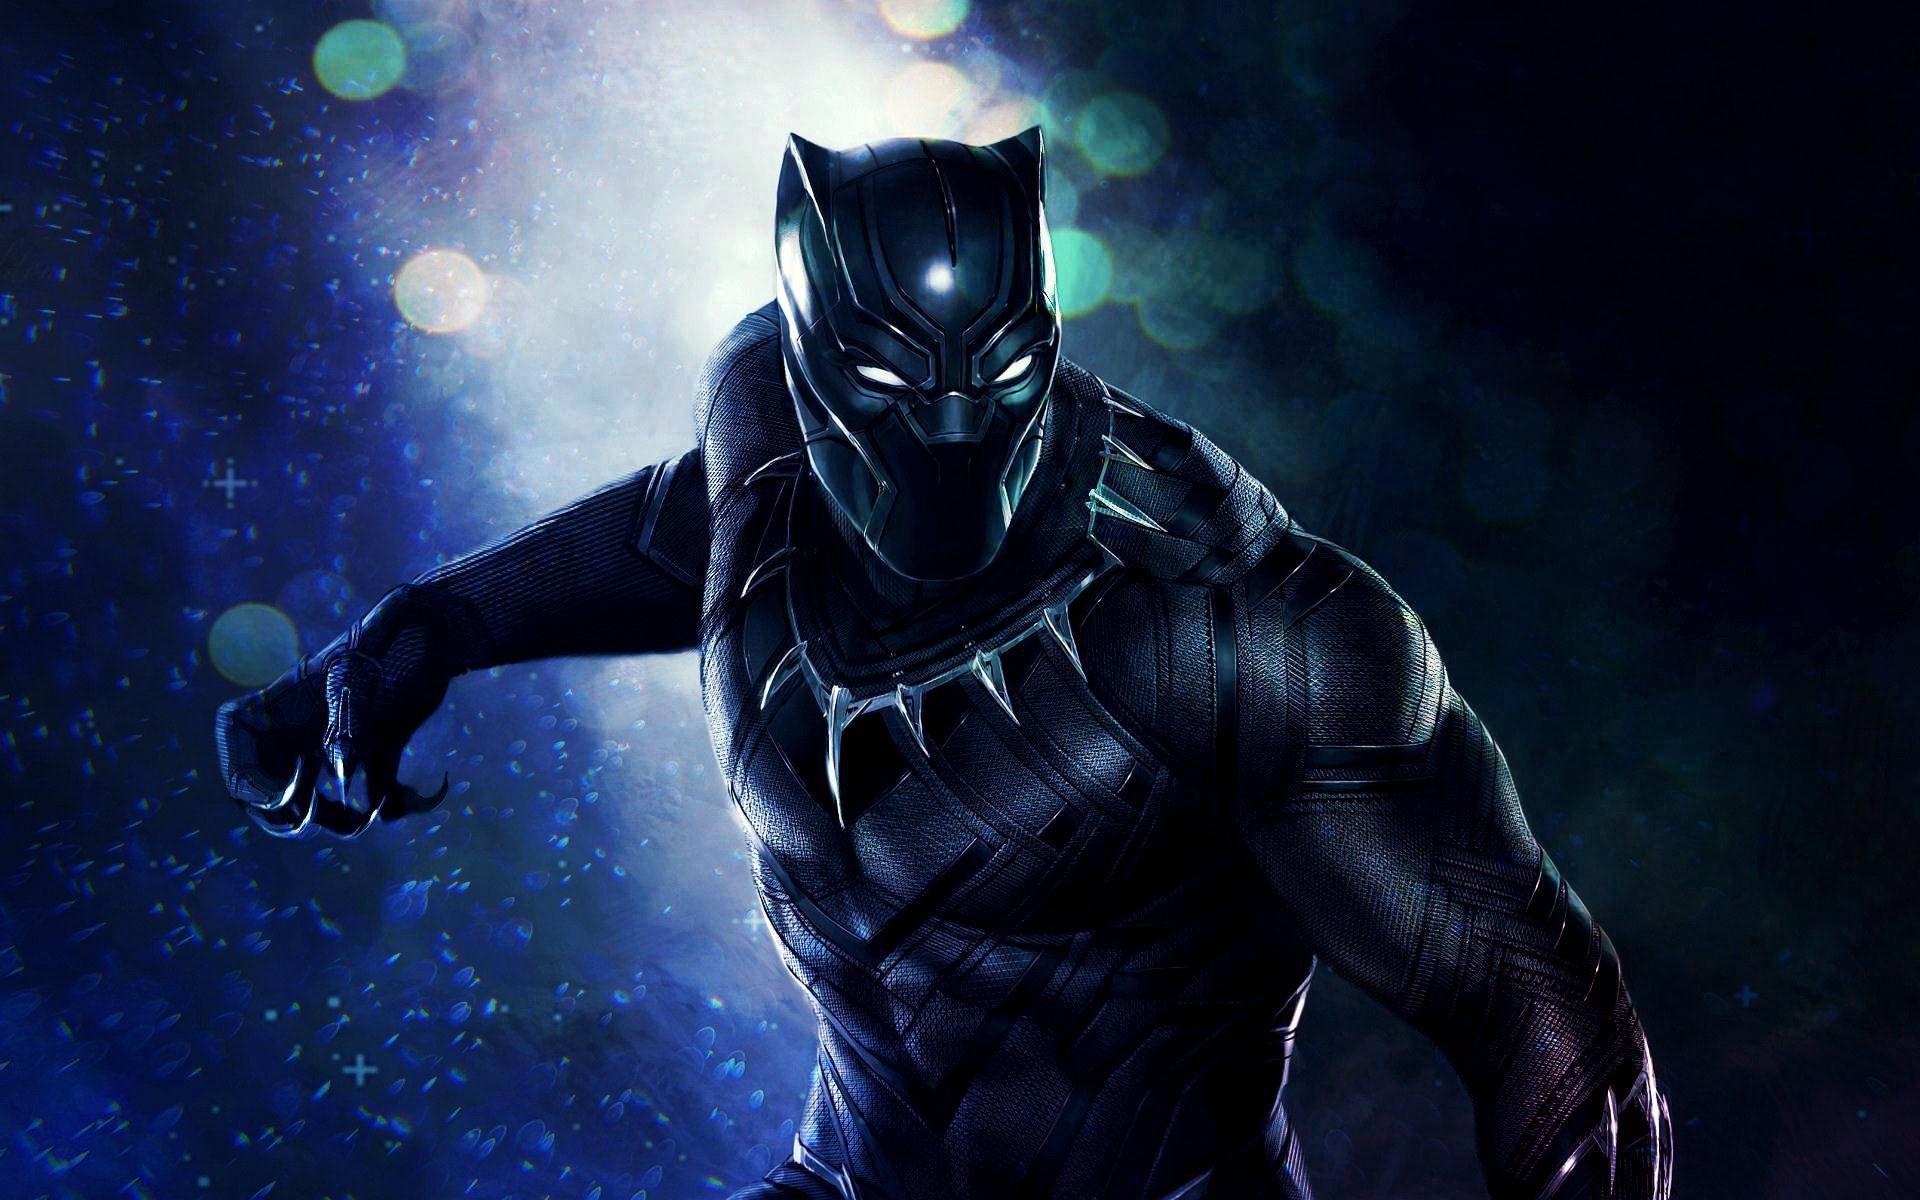 Black Panther 2017 Movie Desktop HD Wallpaper – Stylish HD Wallpapers